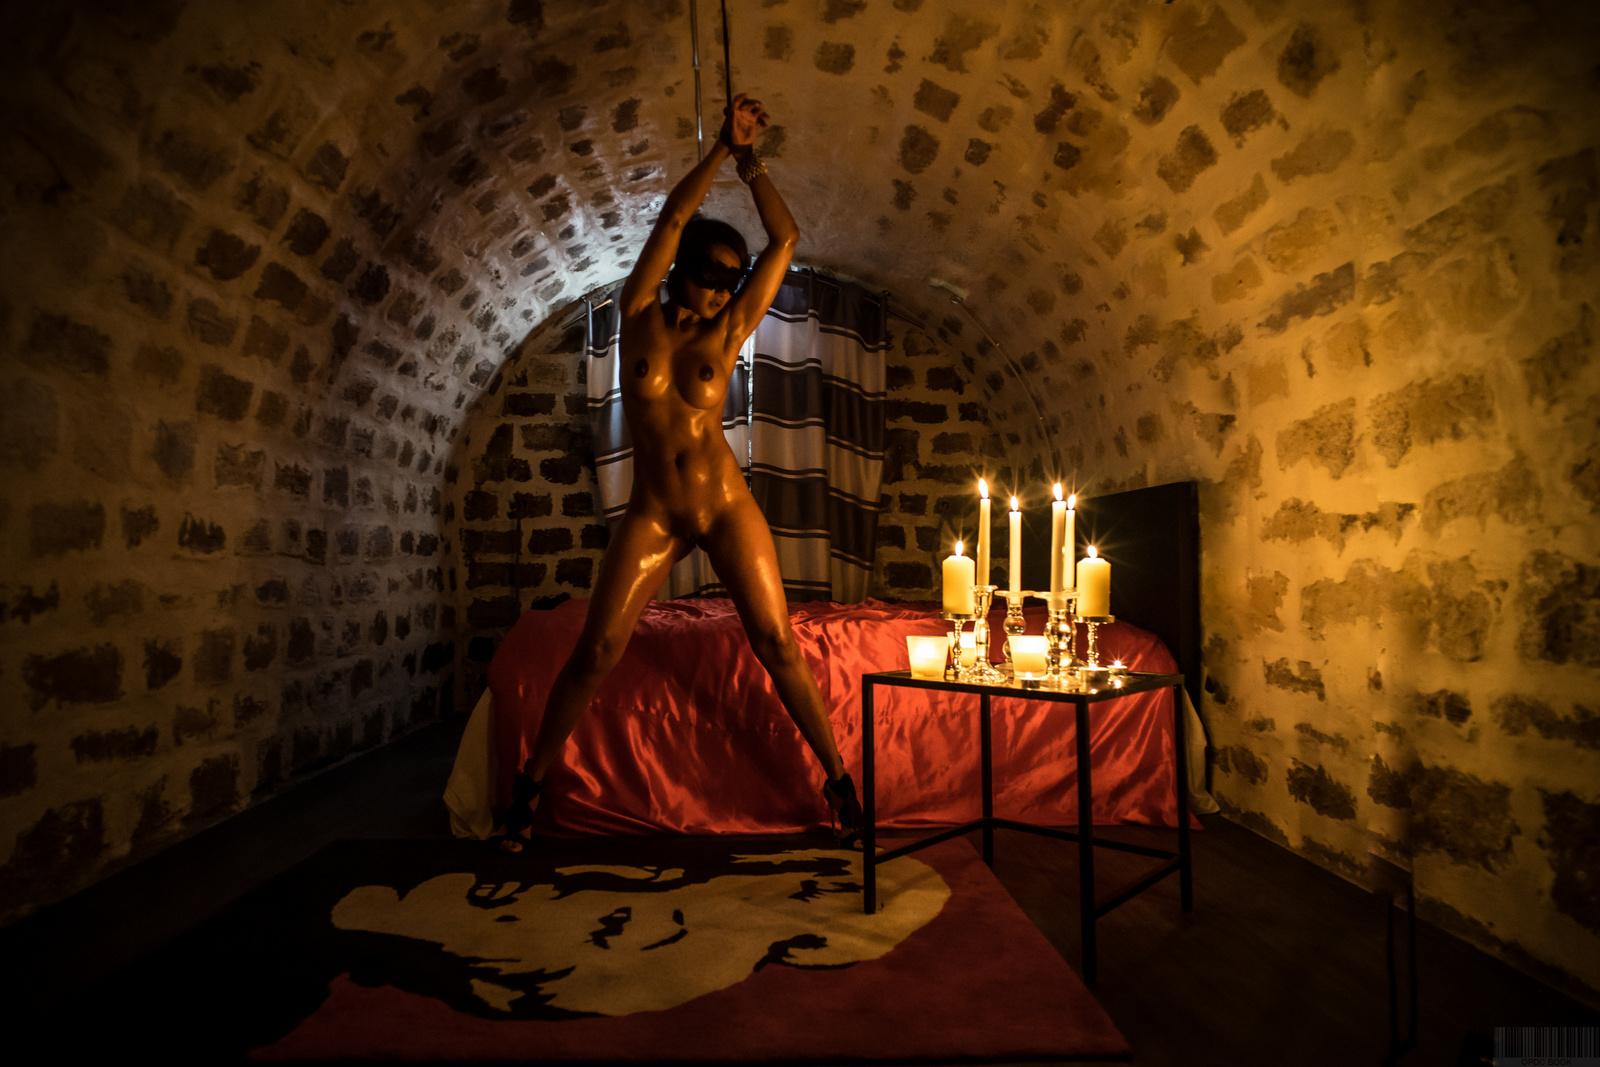 Scène sexy dans un donjon bdsm